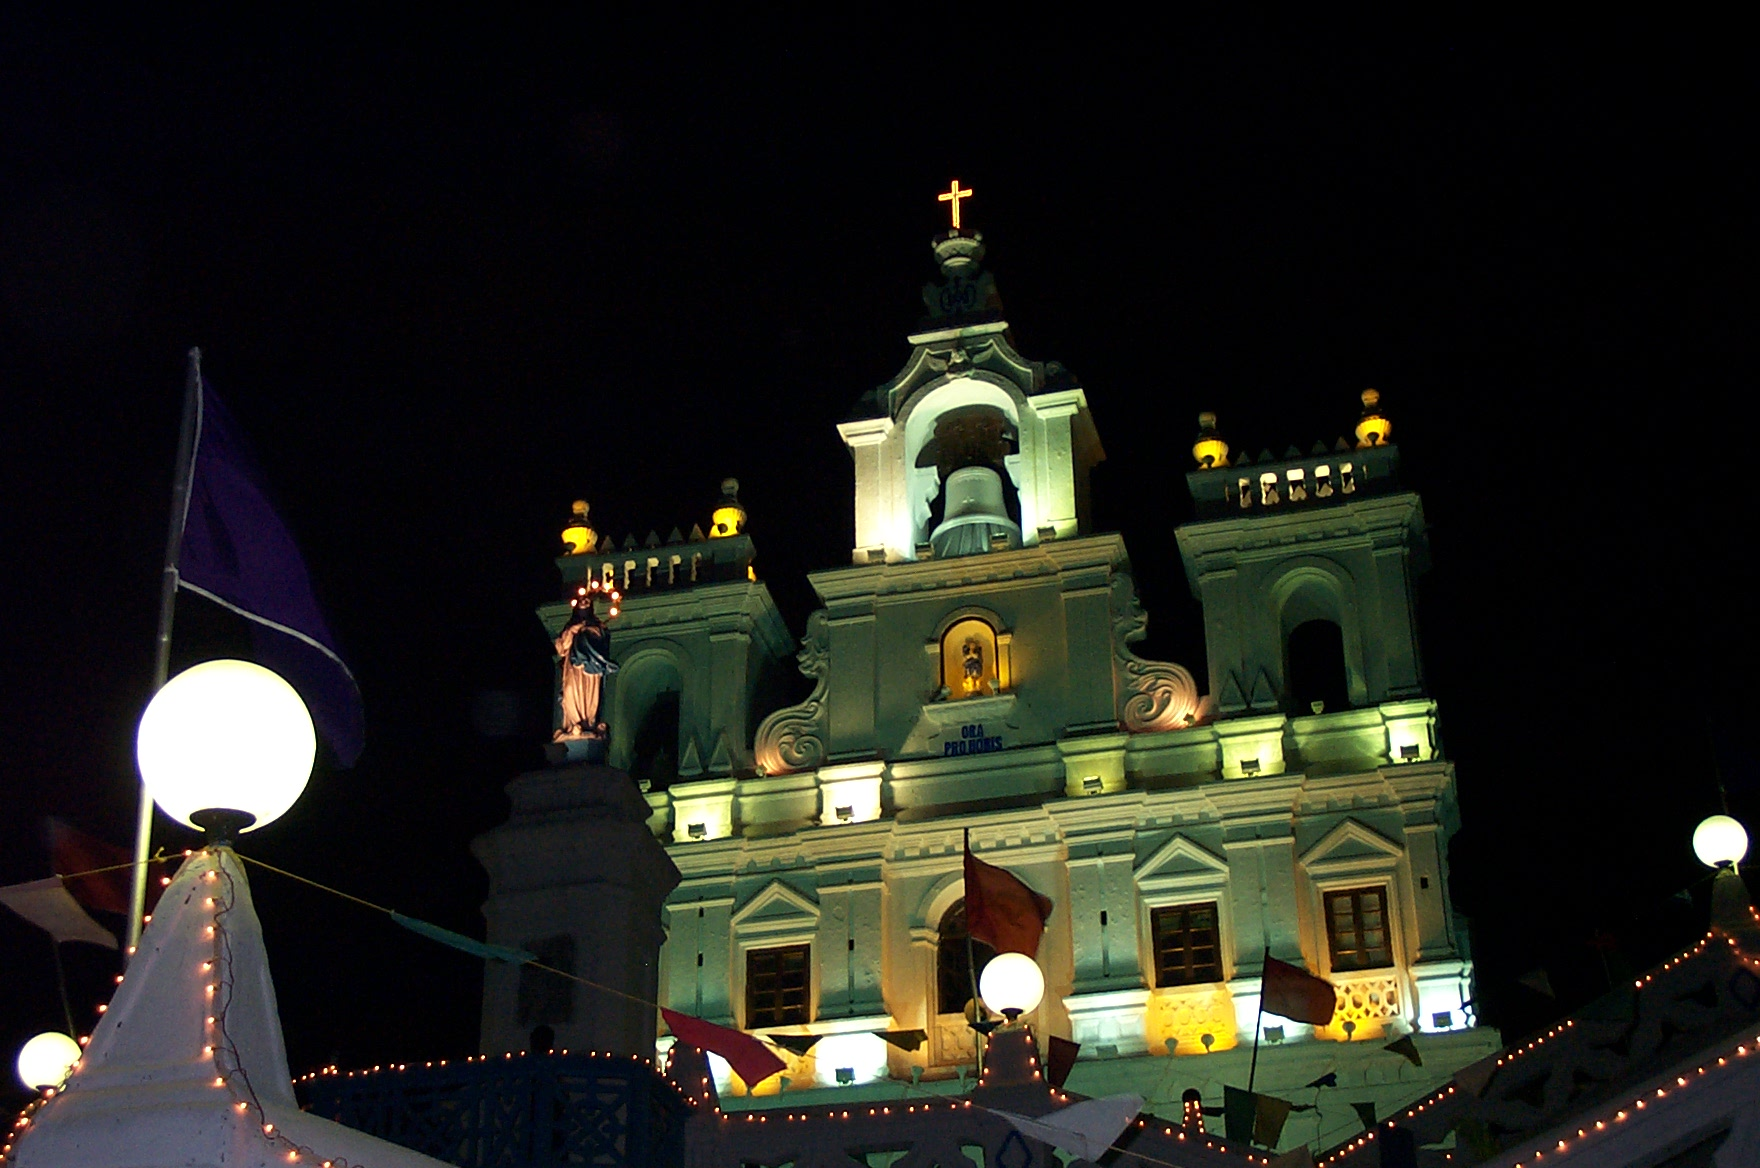 Churches Goa File:india Goa Panjim Church